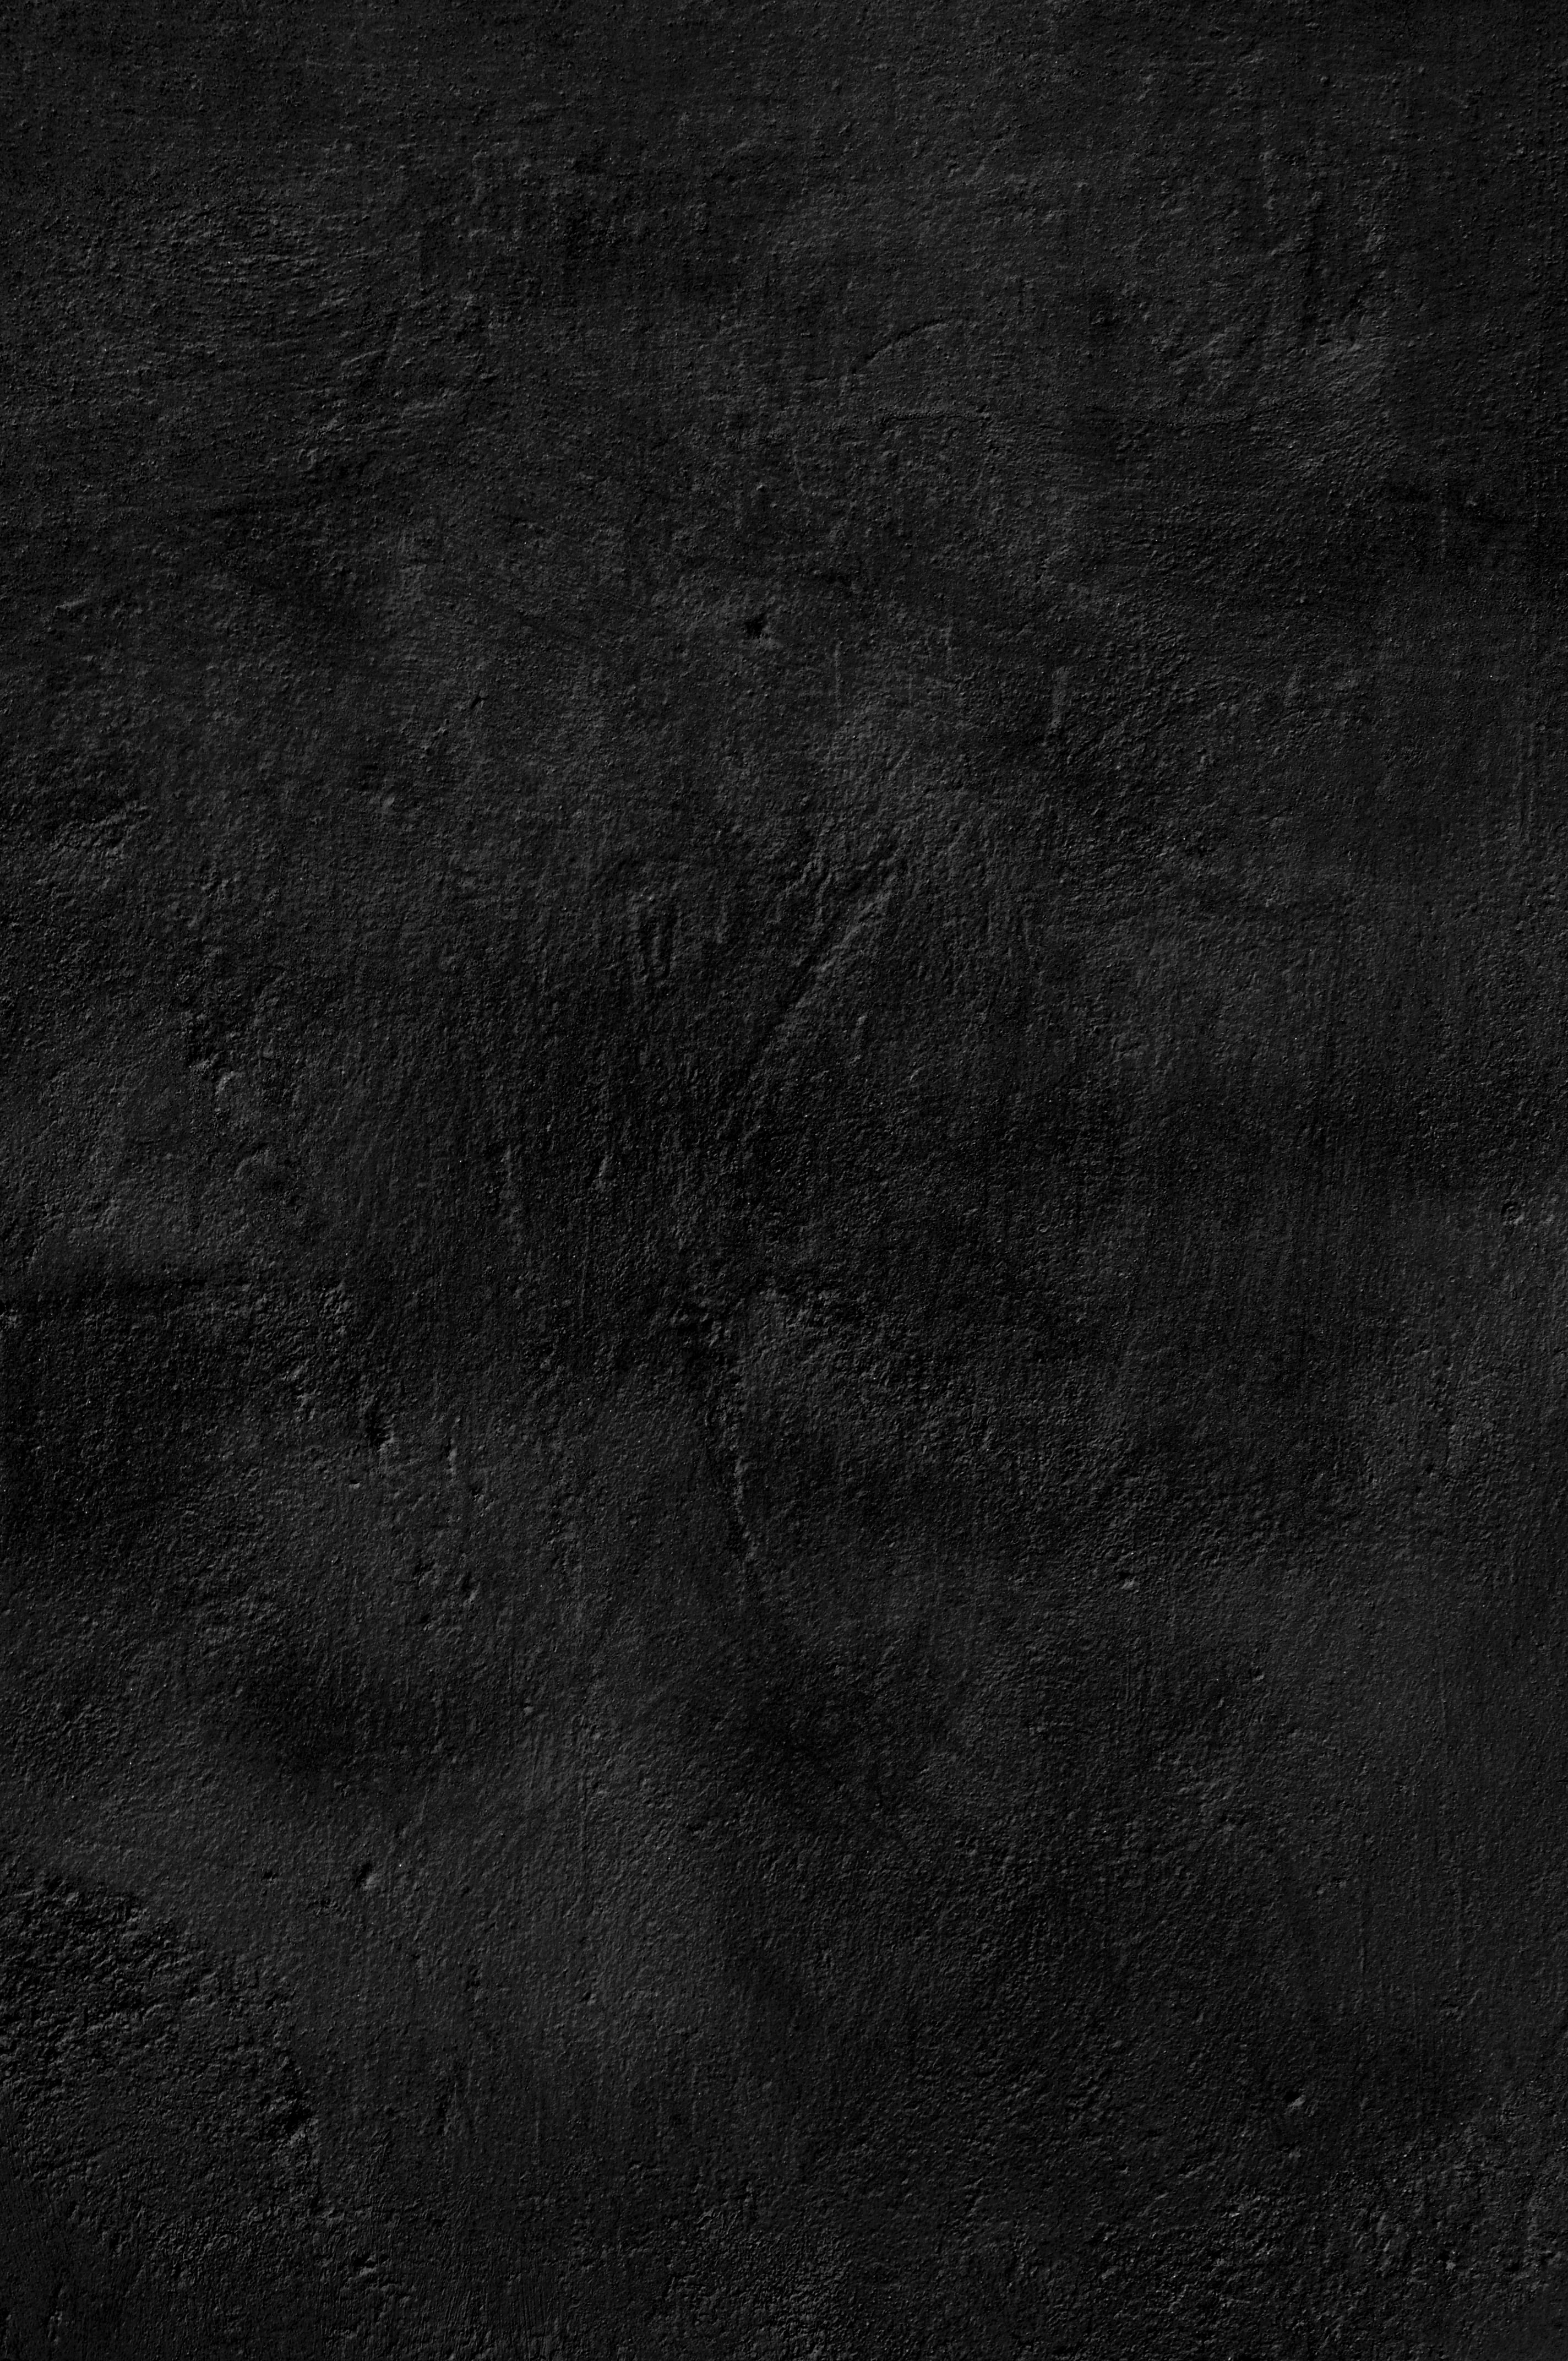 Black Slate Texture : Black slate texture stone textures pinterest